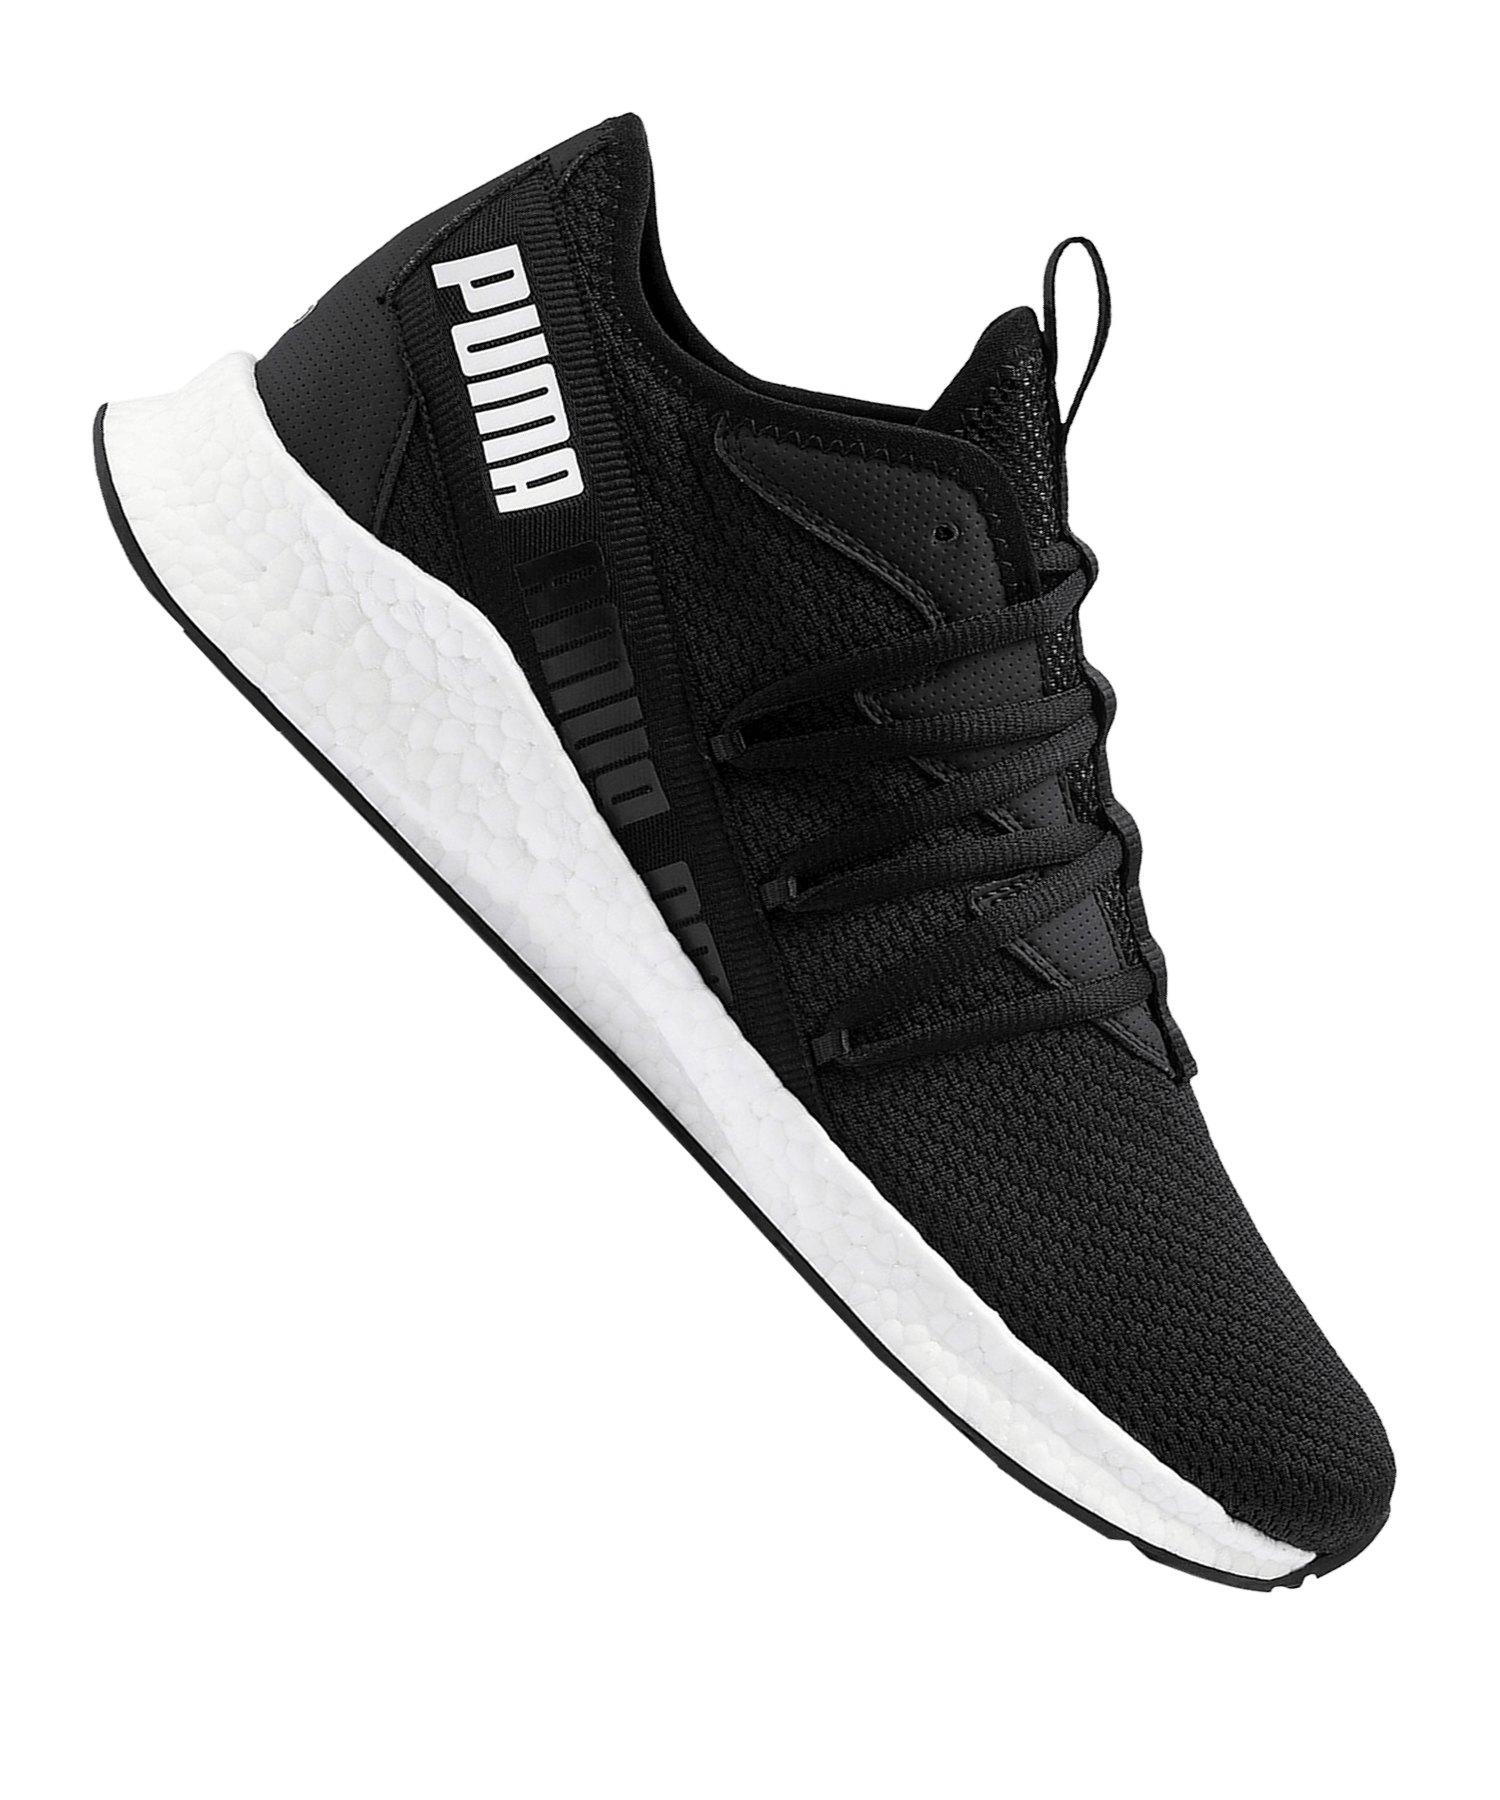 PUMA NRGY Star Sneaker Schwarz F01 - schwarz